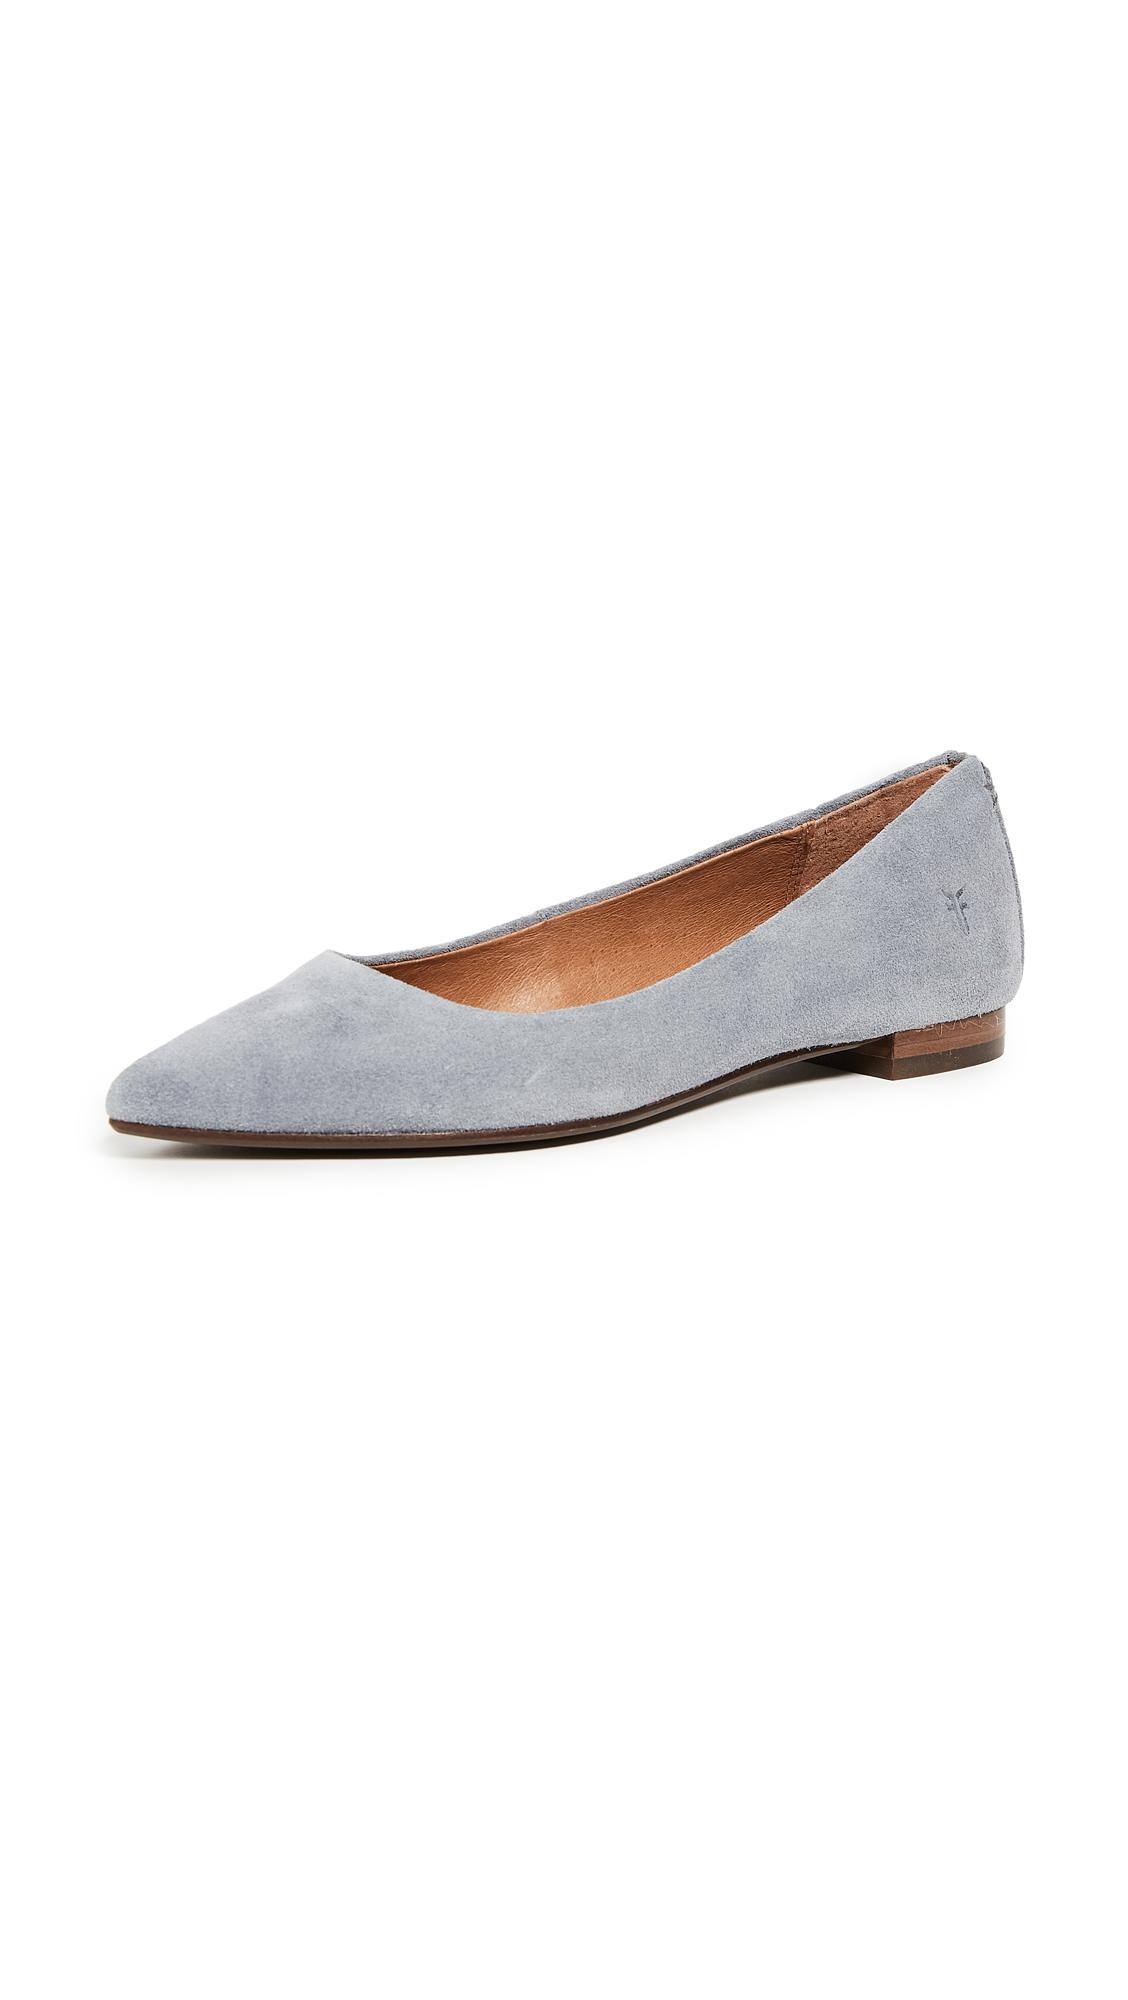 Frye Sienna Ballet Flats - Jeans